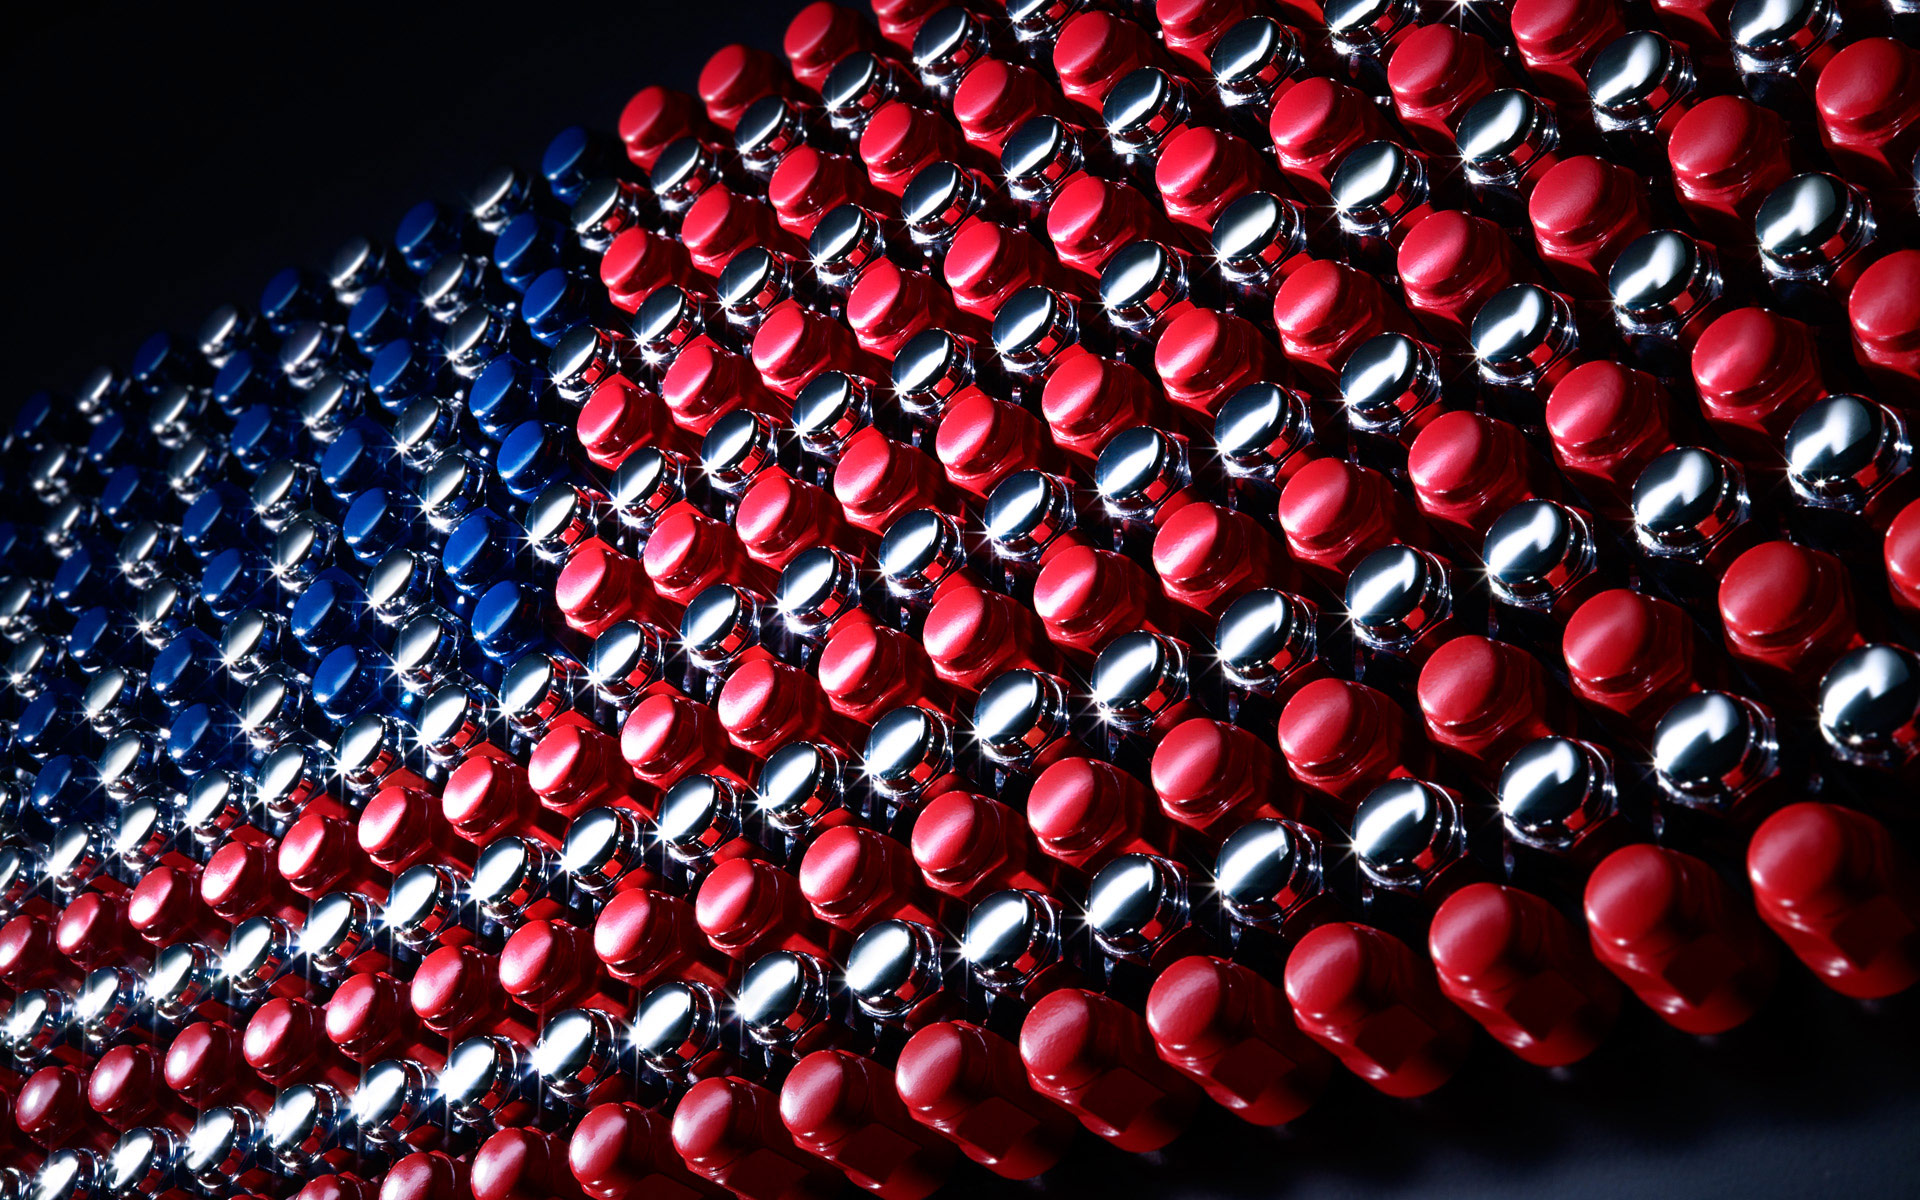 1326_34_U_14_AMERICAN_FLAG_sq.jpg